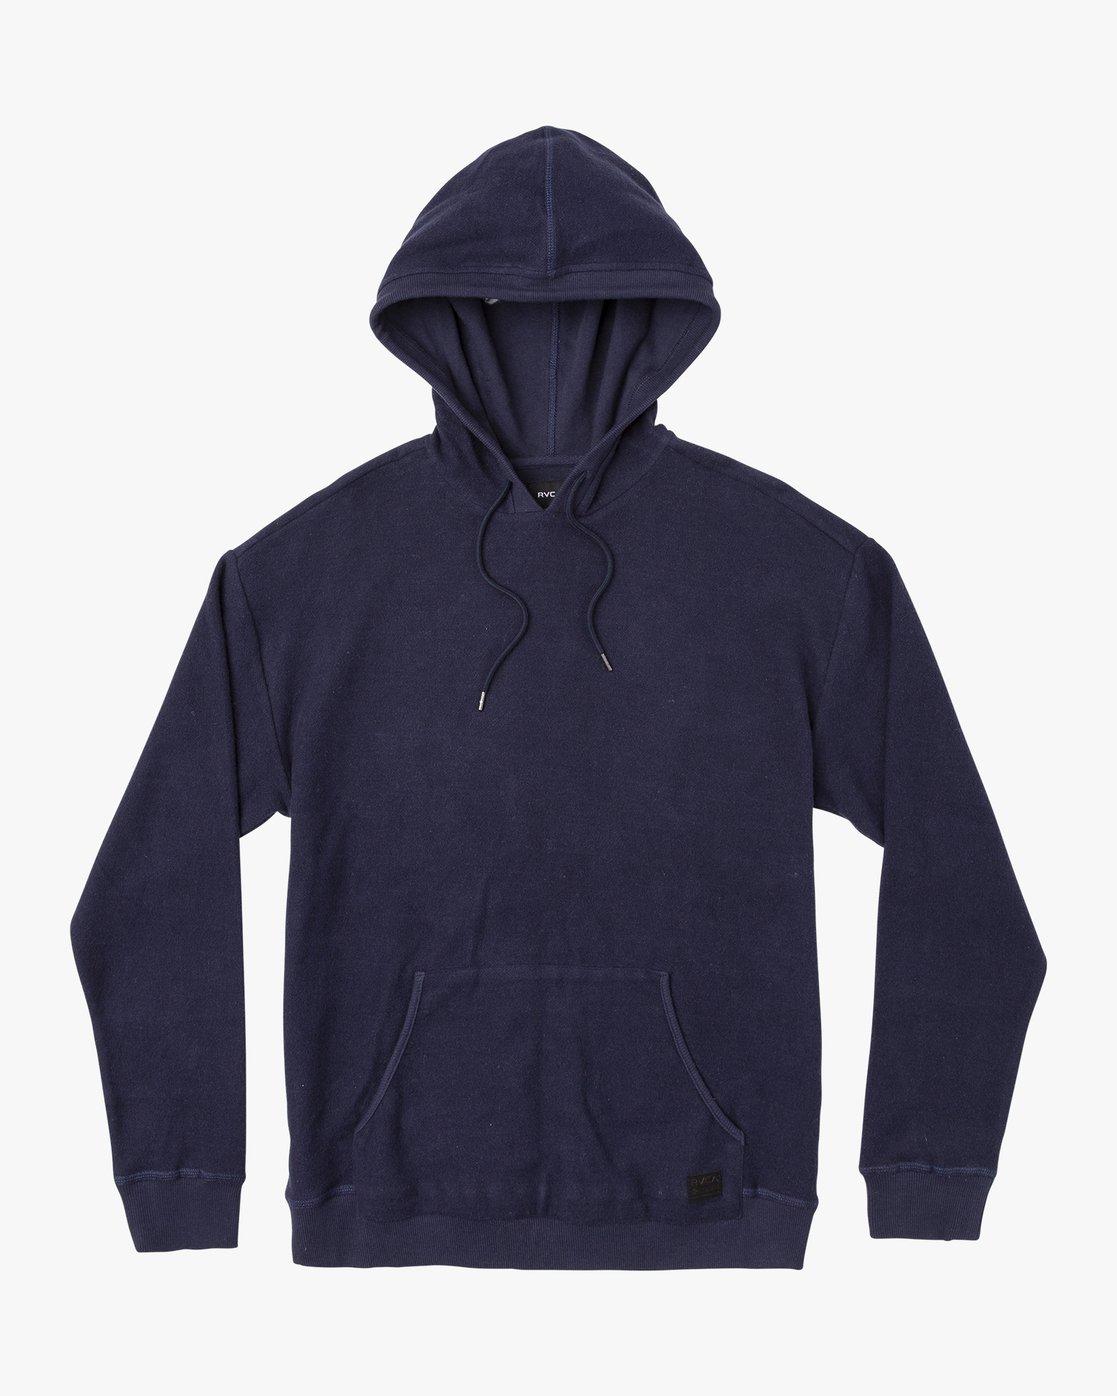 0 Camino  - Sudadera con capucha para Hombre  Q1FLRDRVF9 RVCA